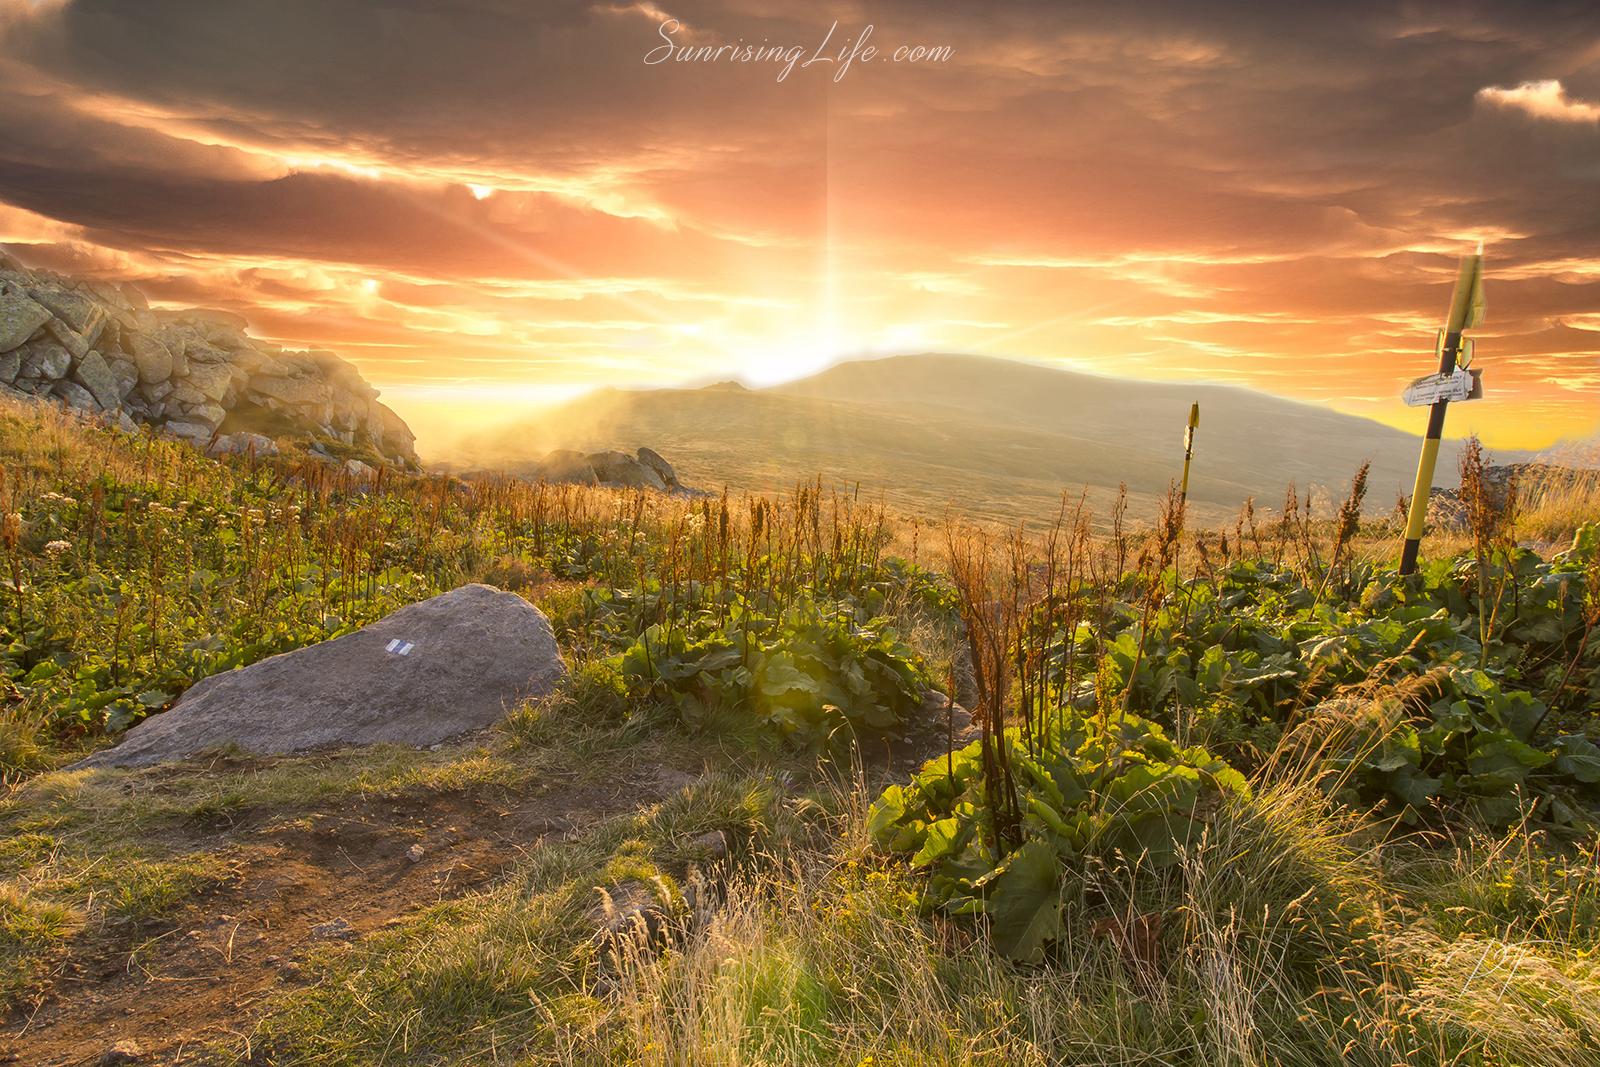 Sunset at Vitahsa mountain